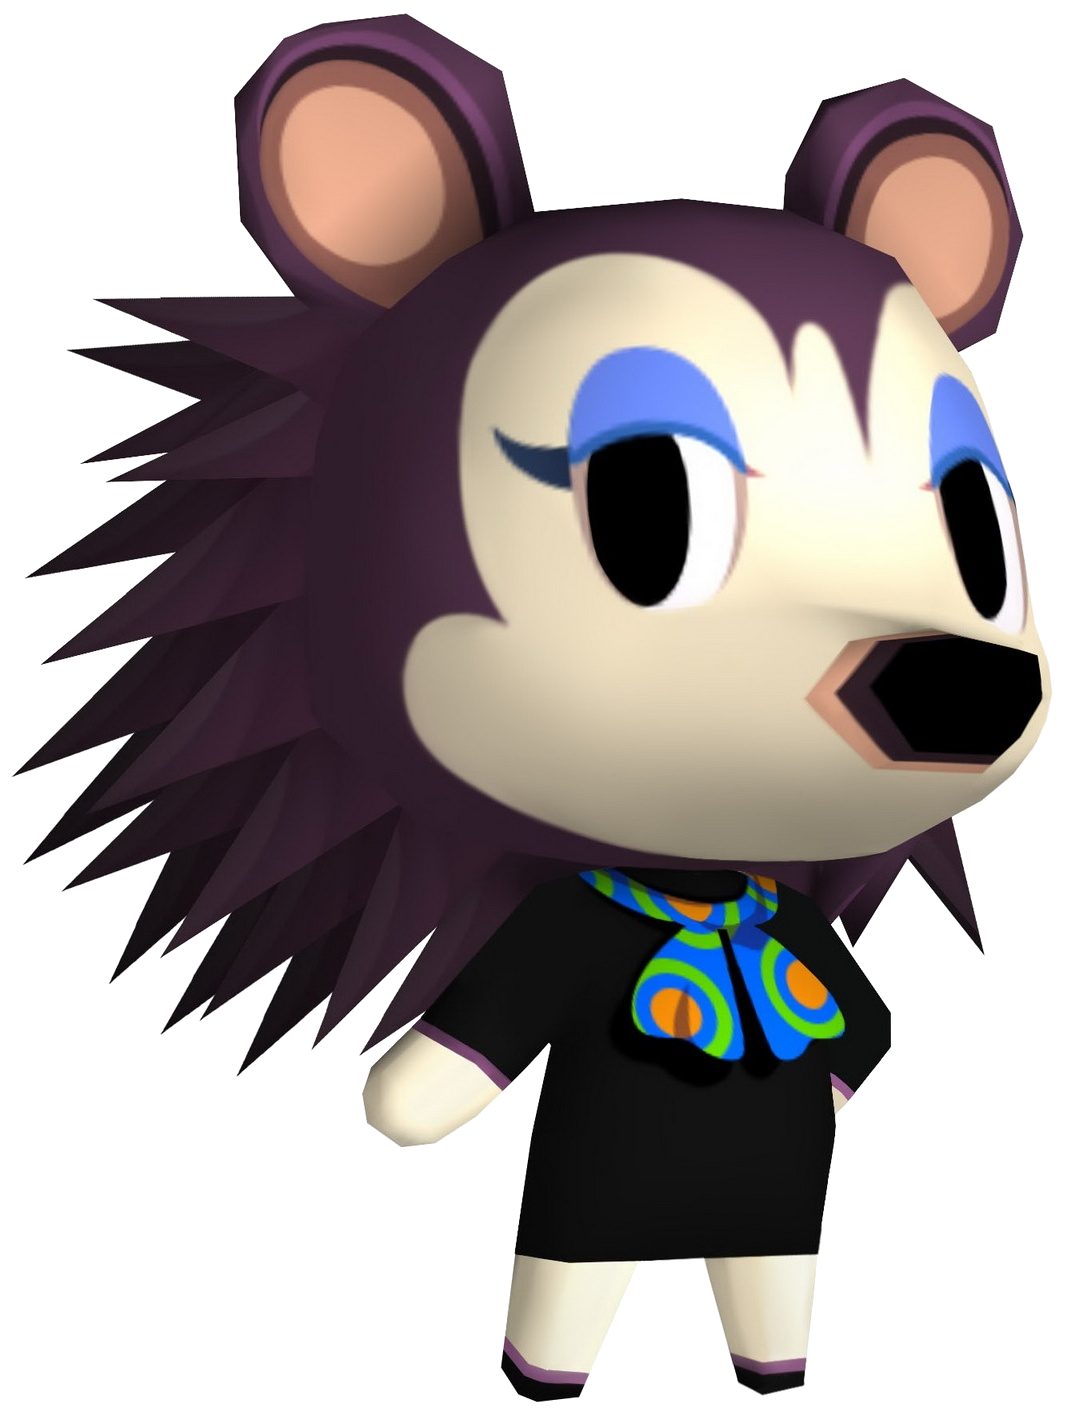 Labelle | Animal Crossing New Leaf Wiki | FANDOM powered ...